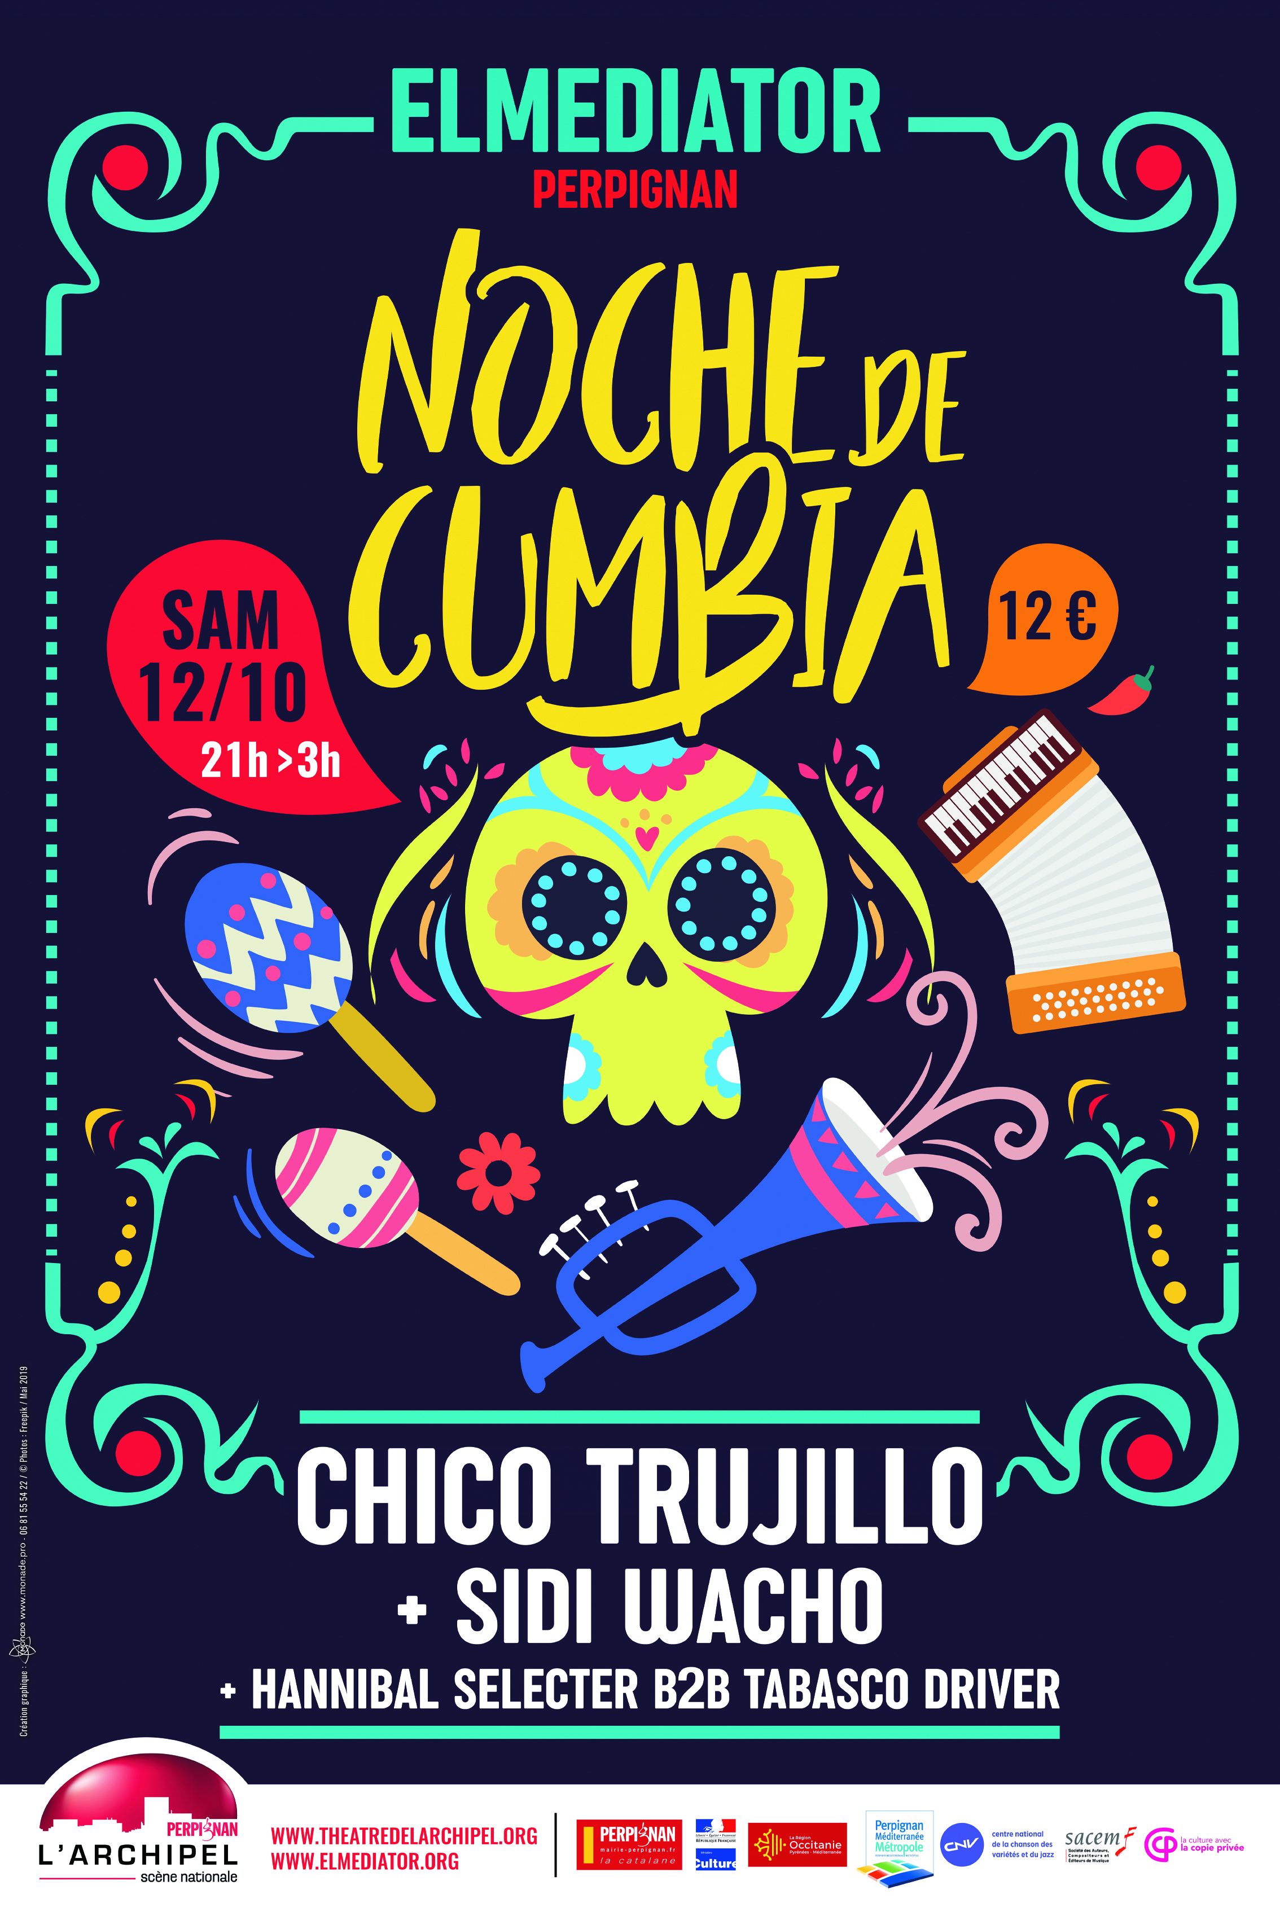 elmediator-2019I20-nocheCumbia-affiche80x120-72dpi-1.jpg